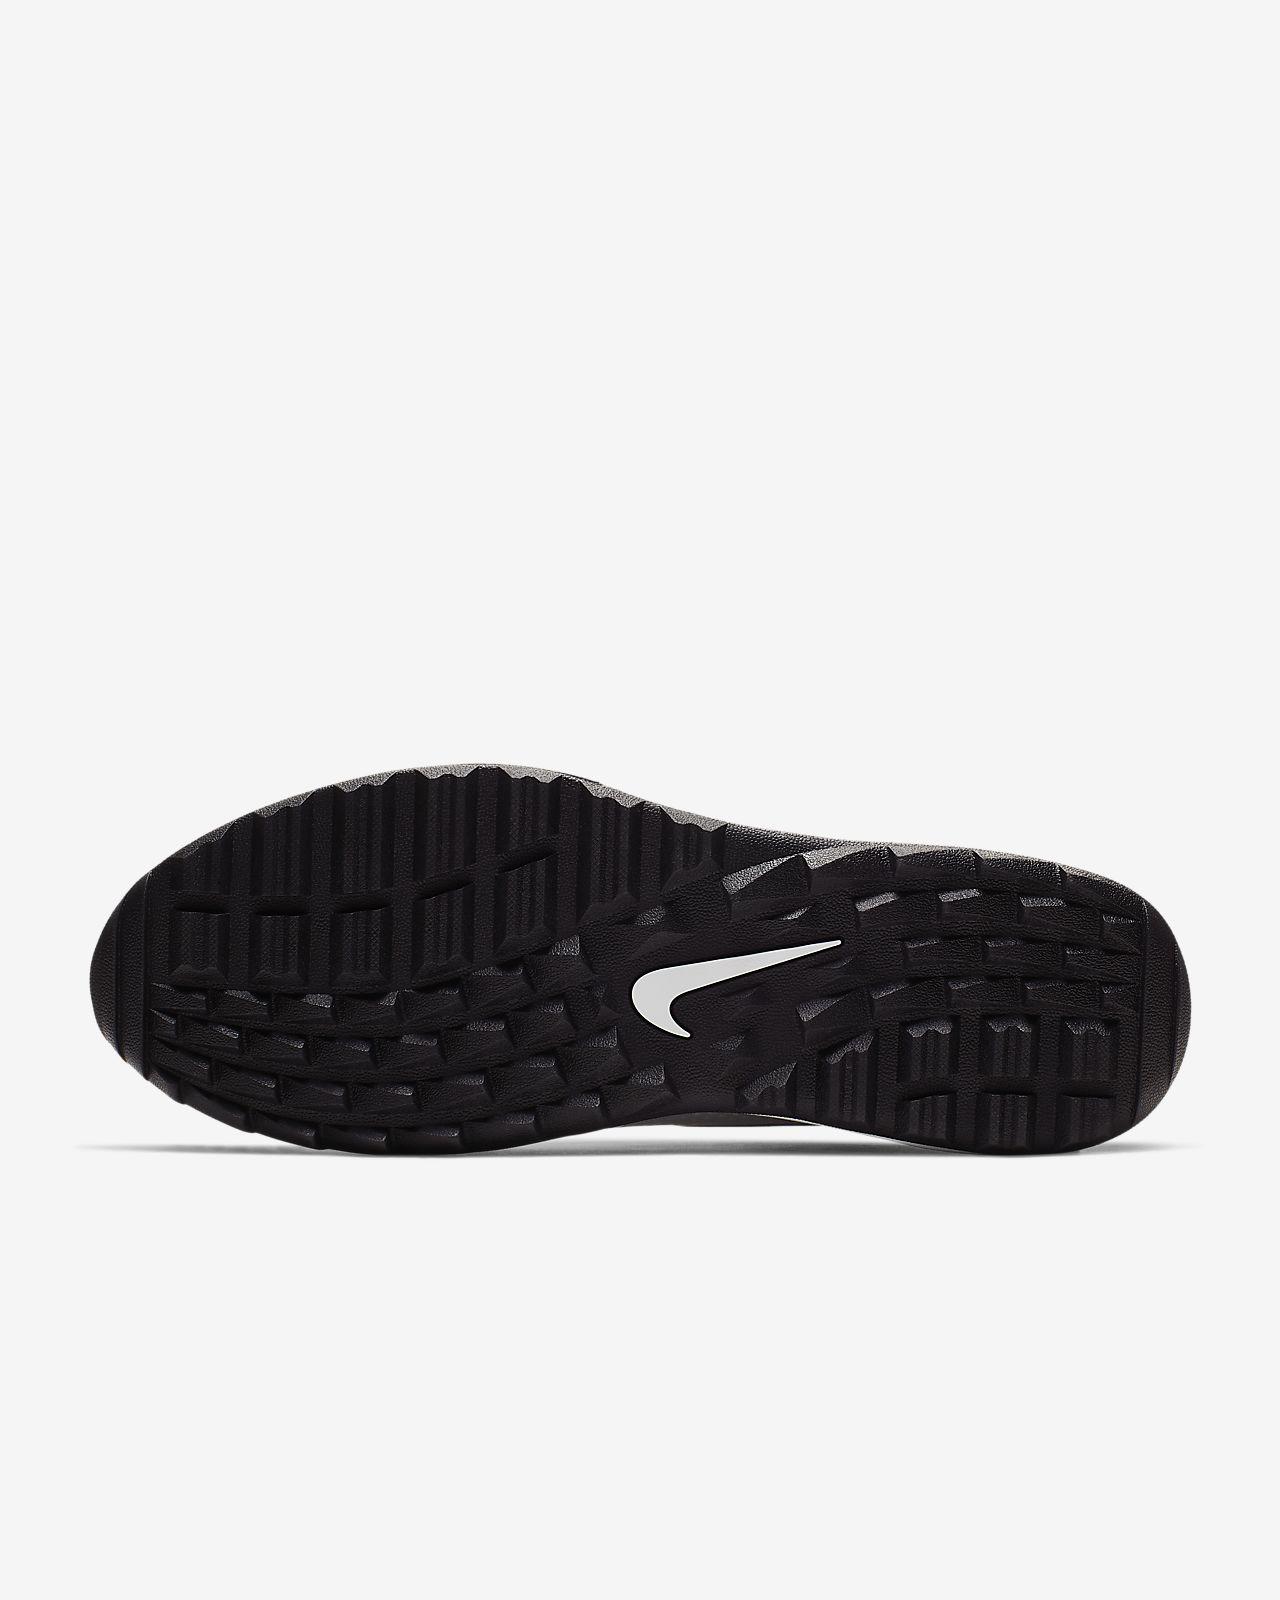 0190f97ca Nike Air Max 1 G Men s Golf Shoe. Nike.com